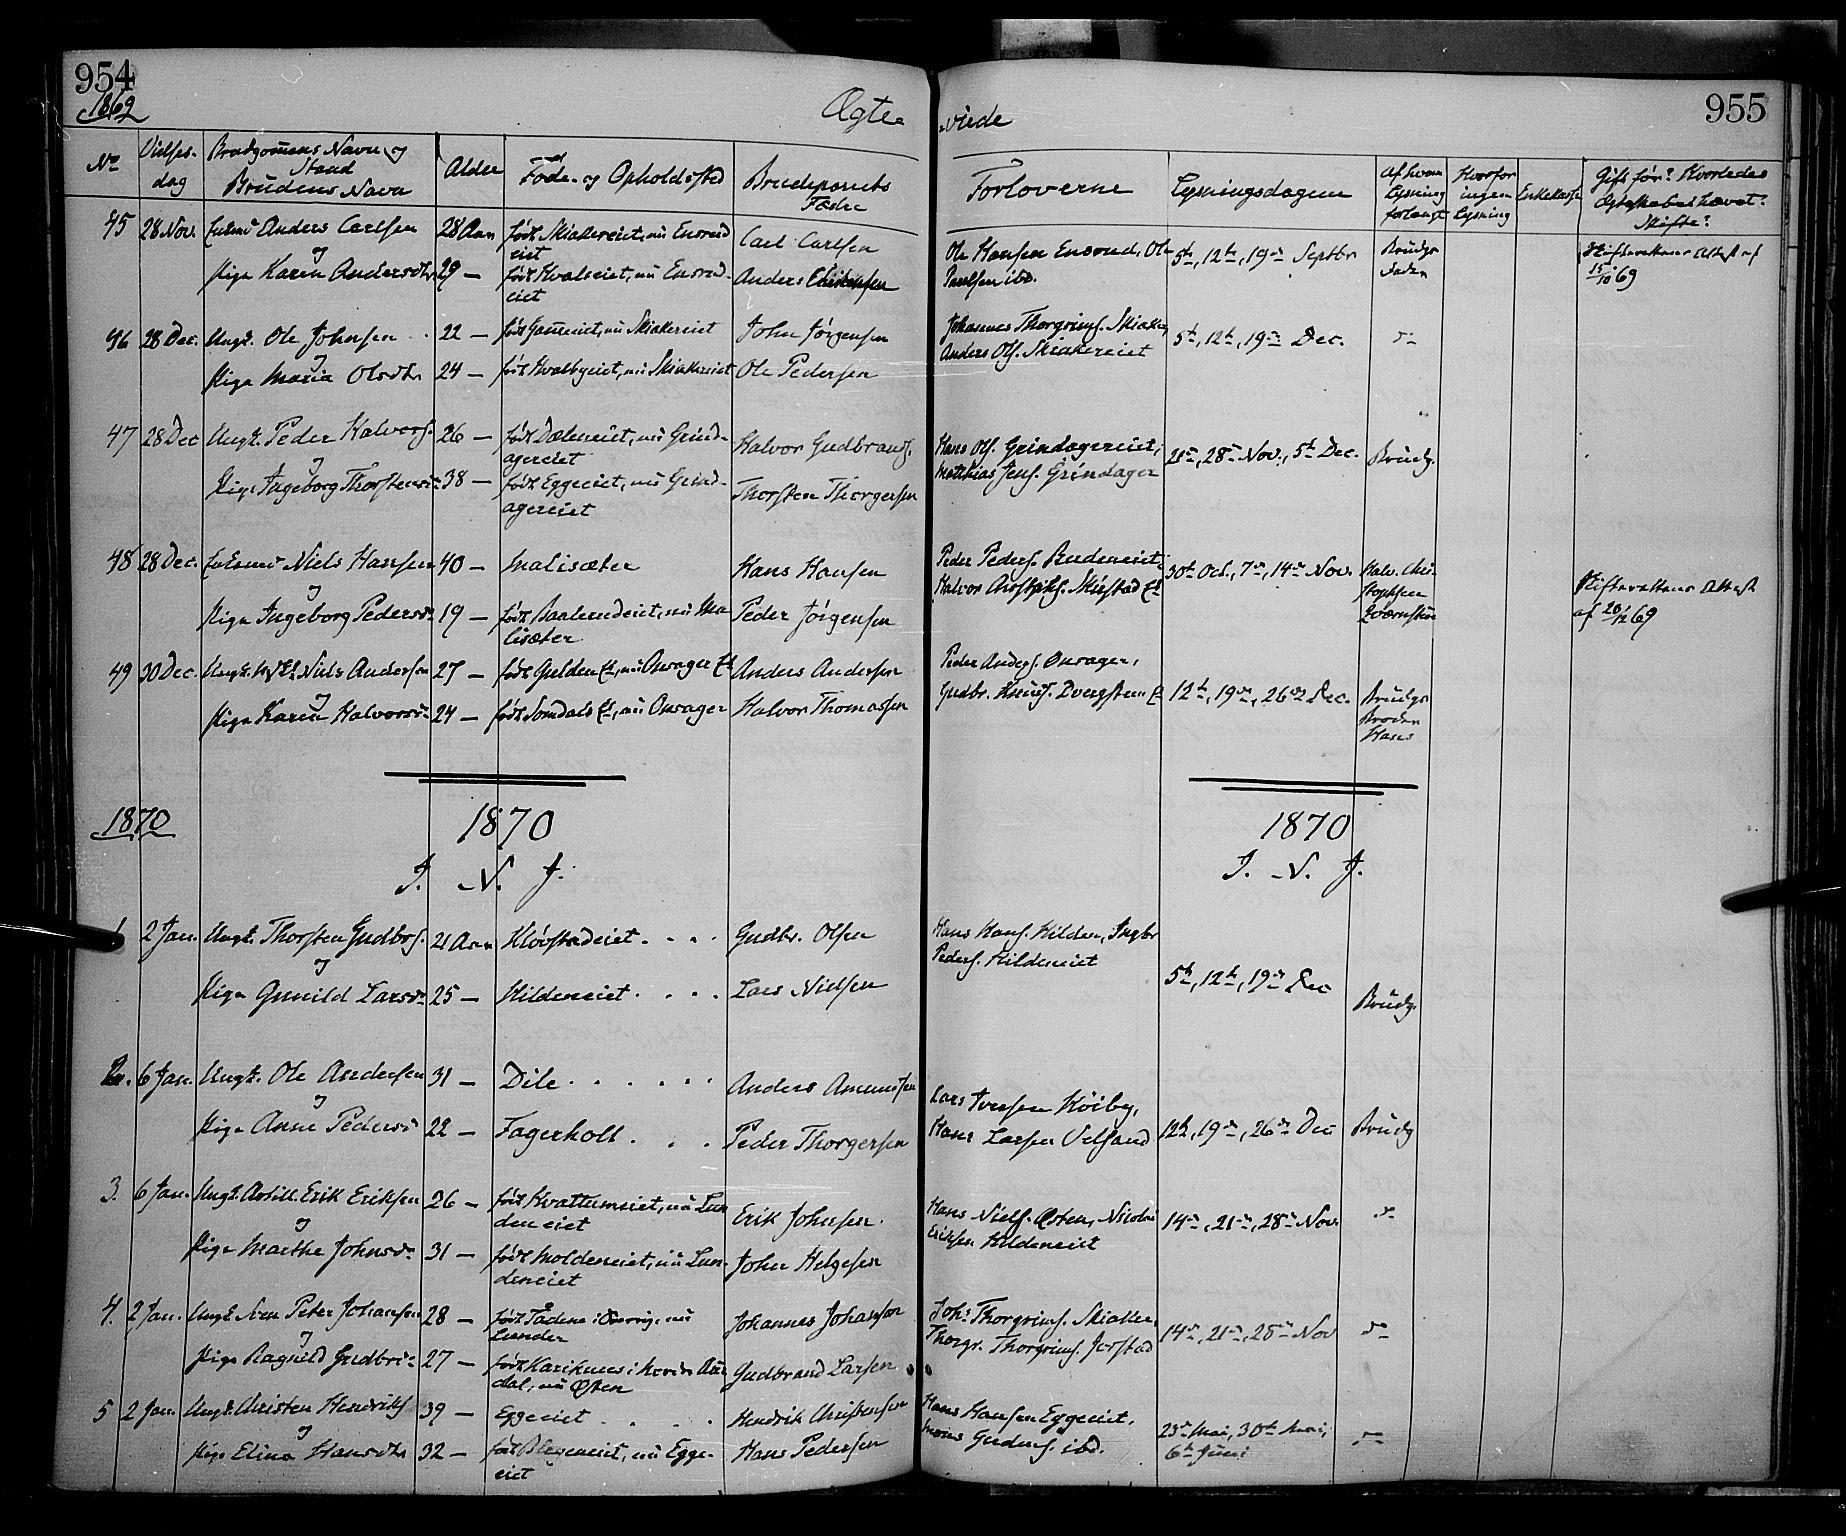 SAH, Gran prestekontor, Ministerialbok nr. 12, 1856-1874, s. 954-955